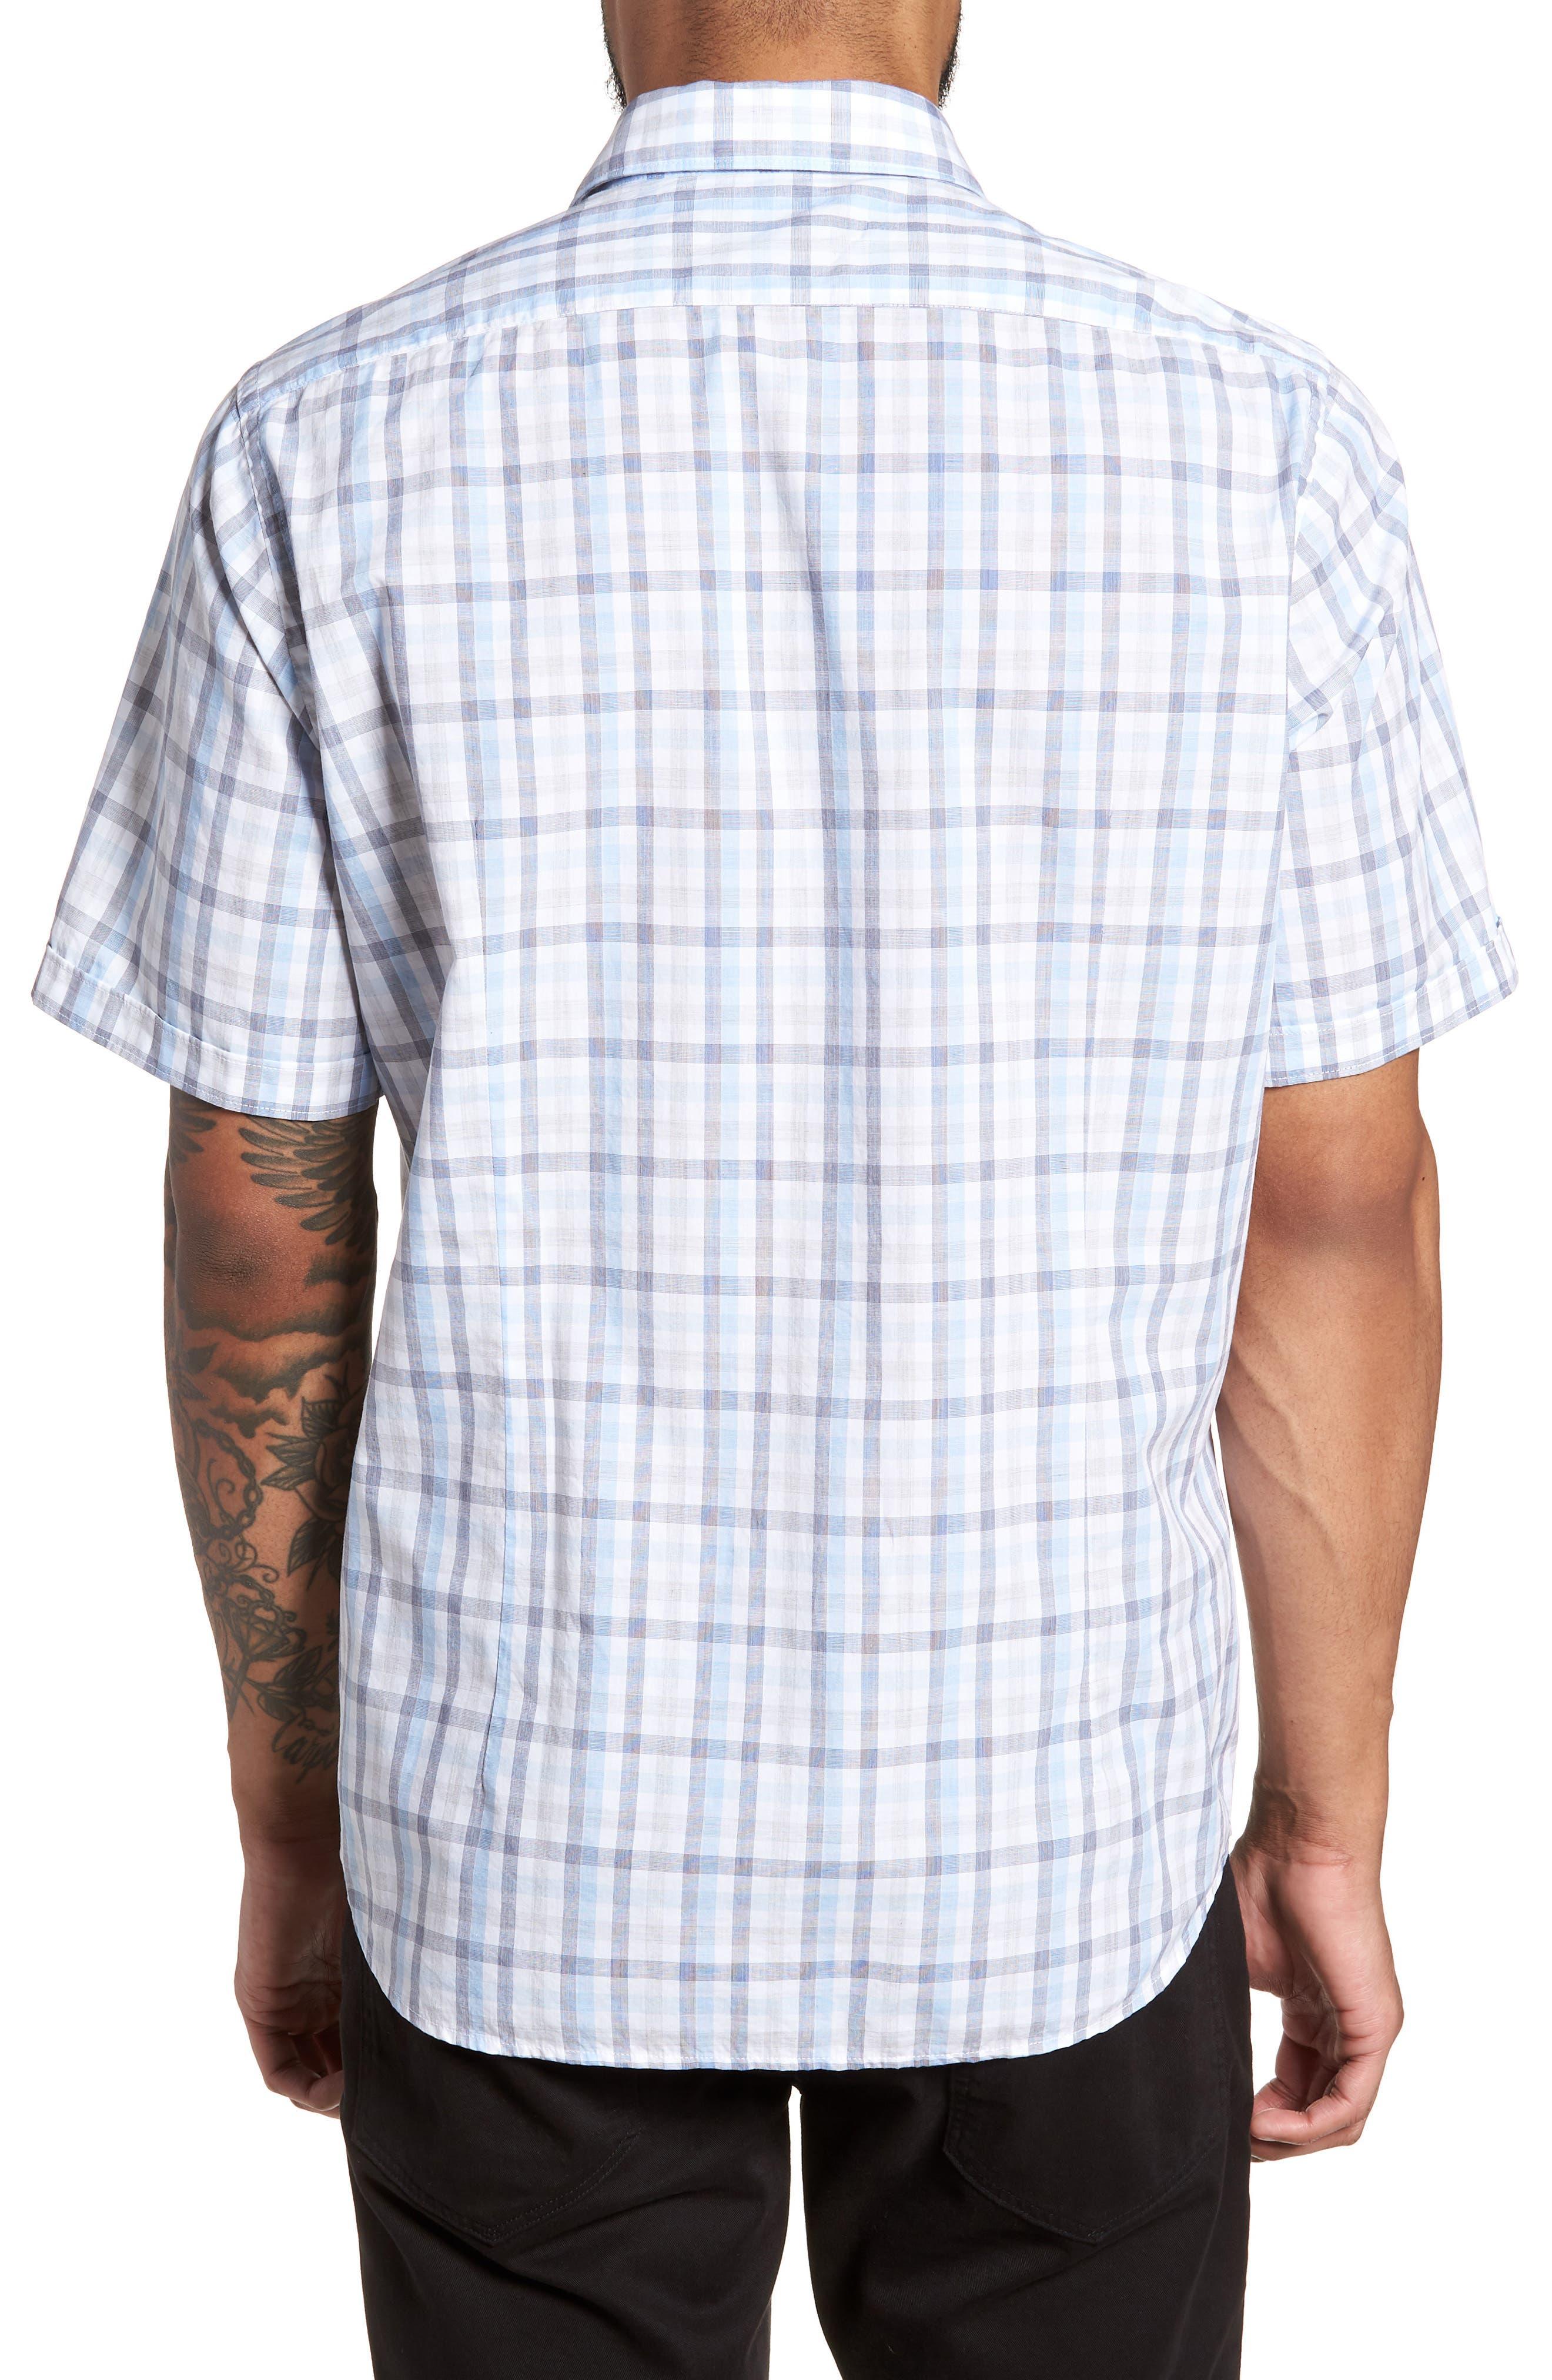 Luka Slim Fit Short Sleeve Sport Shirt,                             Alternate thumbnail 2, color,